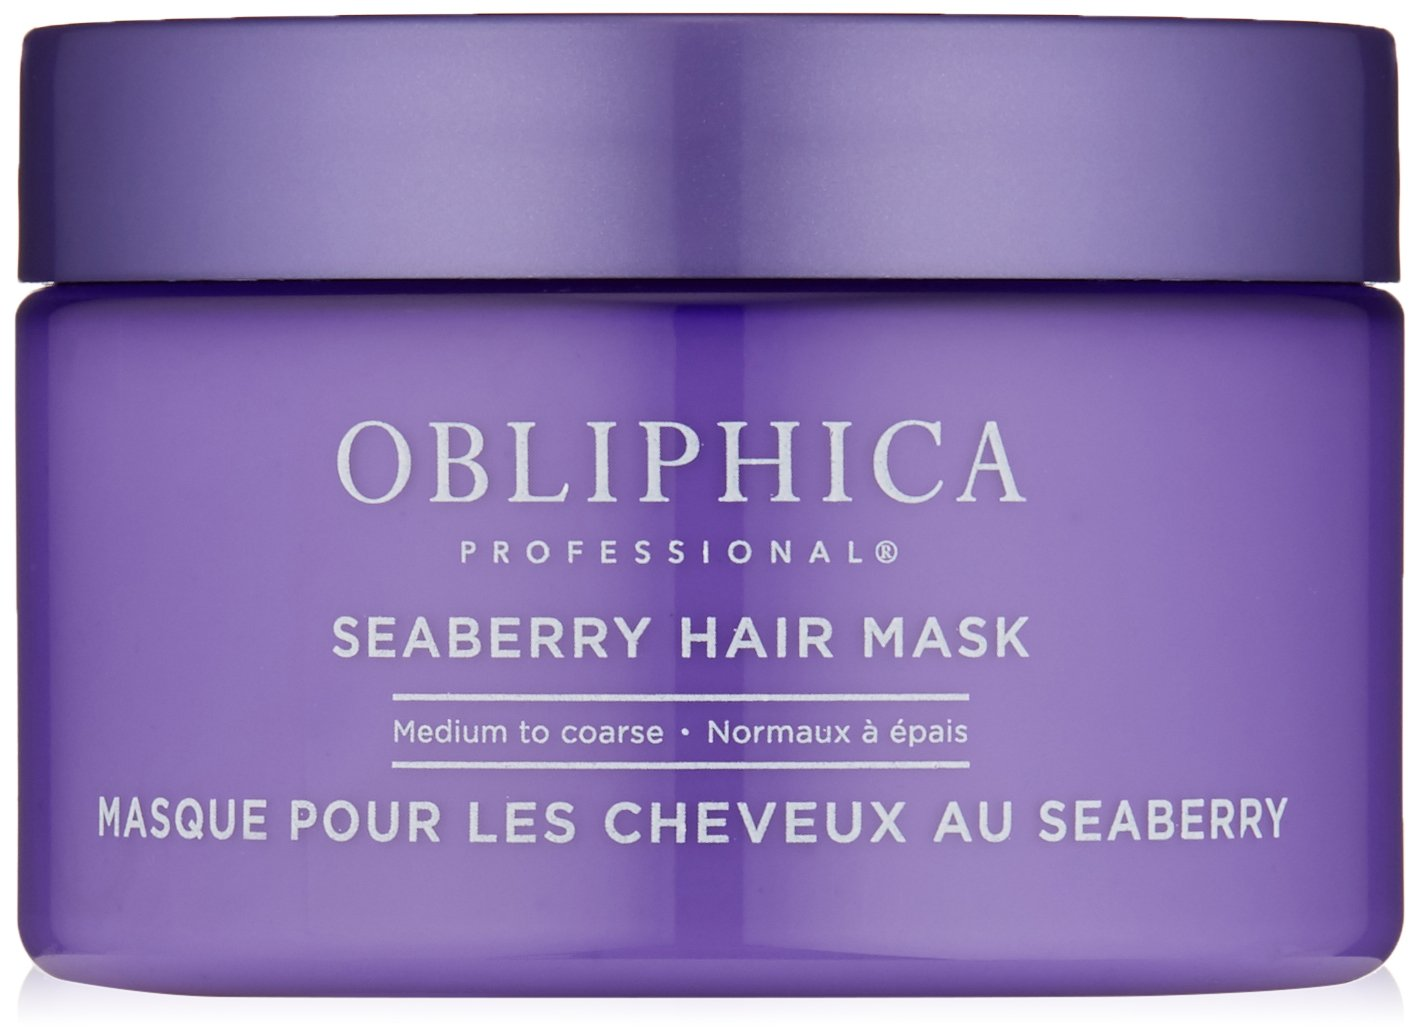 Obliphica Professional Seaberry Medium to Coarse Mask, 8.5 oz.